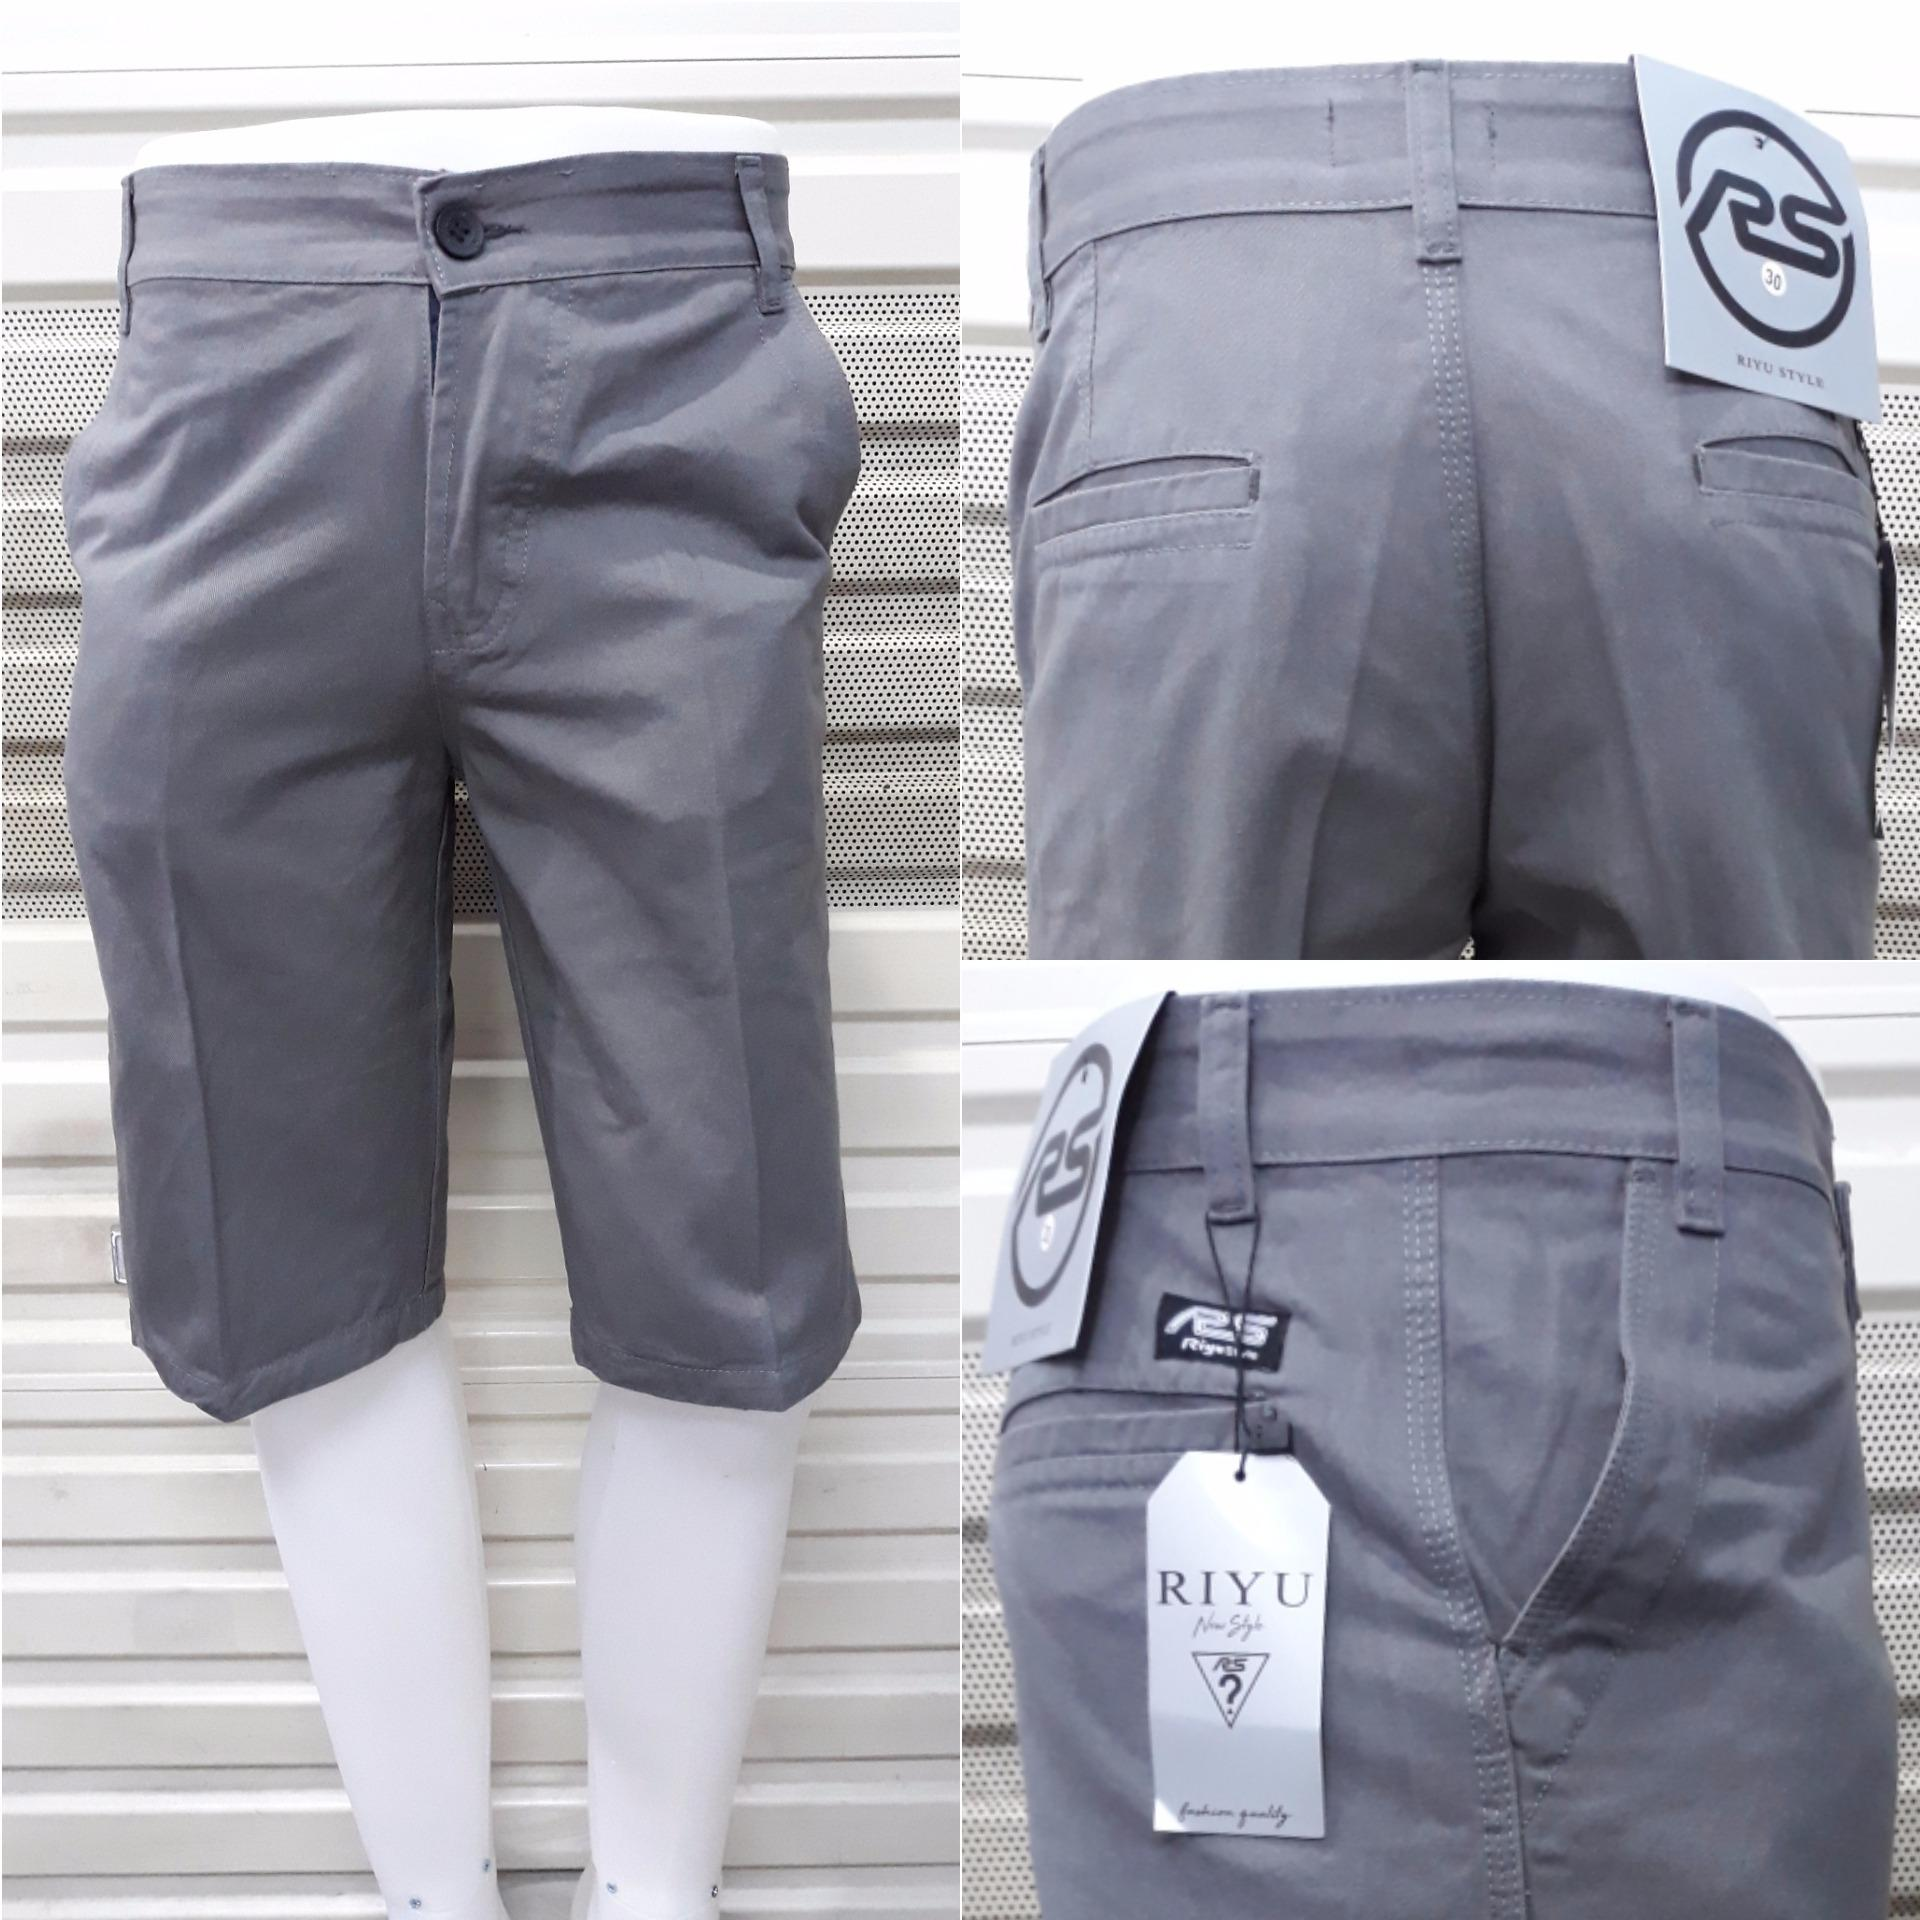 Jual Murah Celana Cargo Pendek Pria Trend Terbaru Info Fashion Cino Warna Abu Muda Bagus